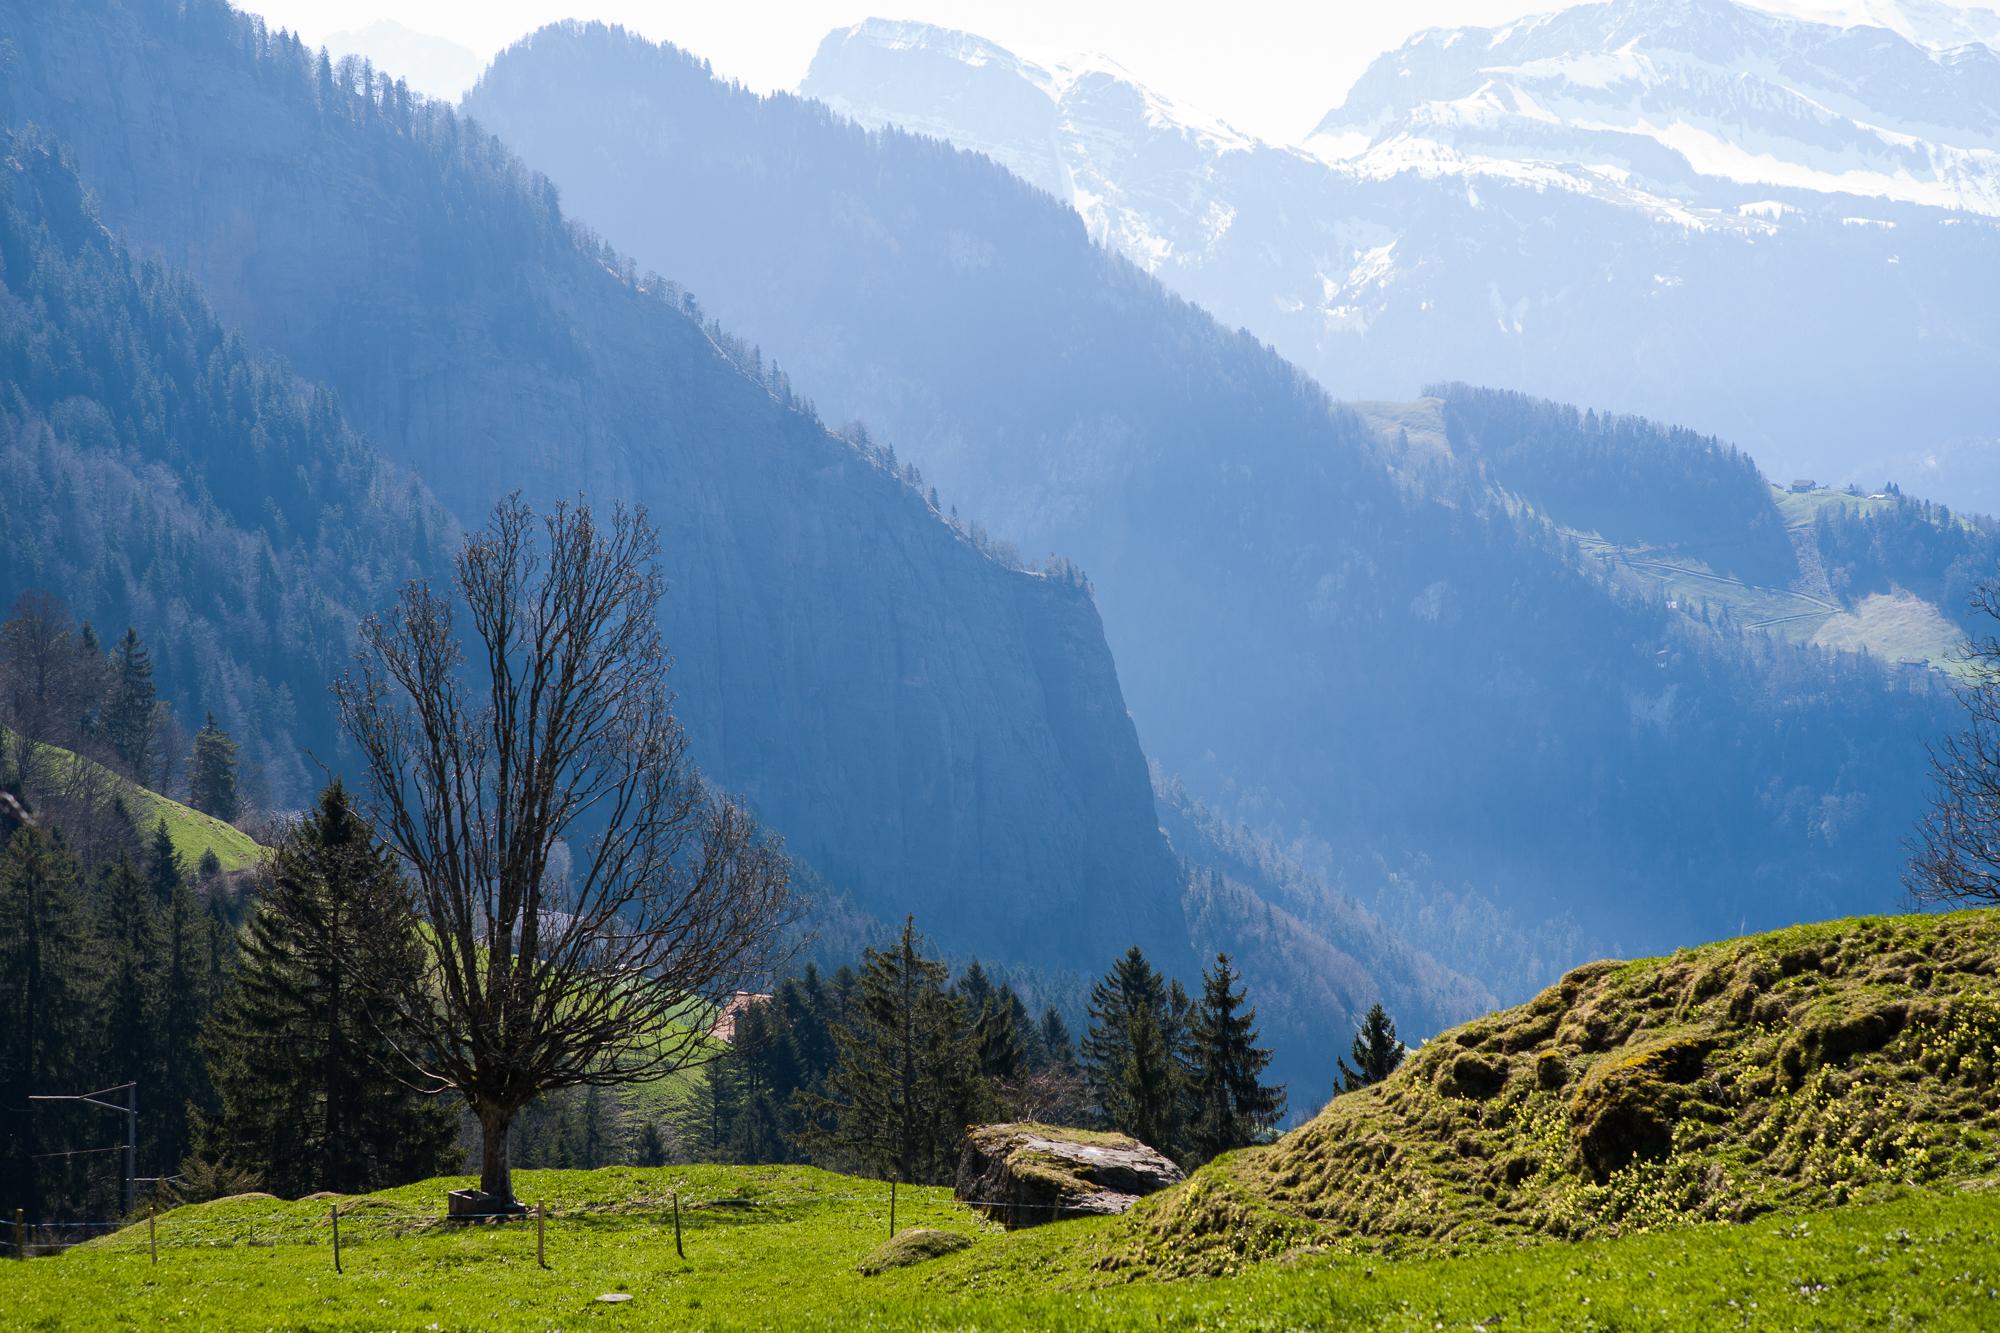 Hiking down to Weggis from Rigi Kaltbad